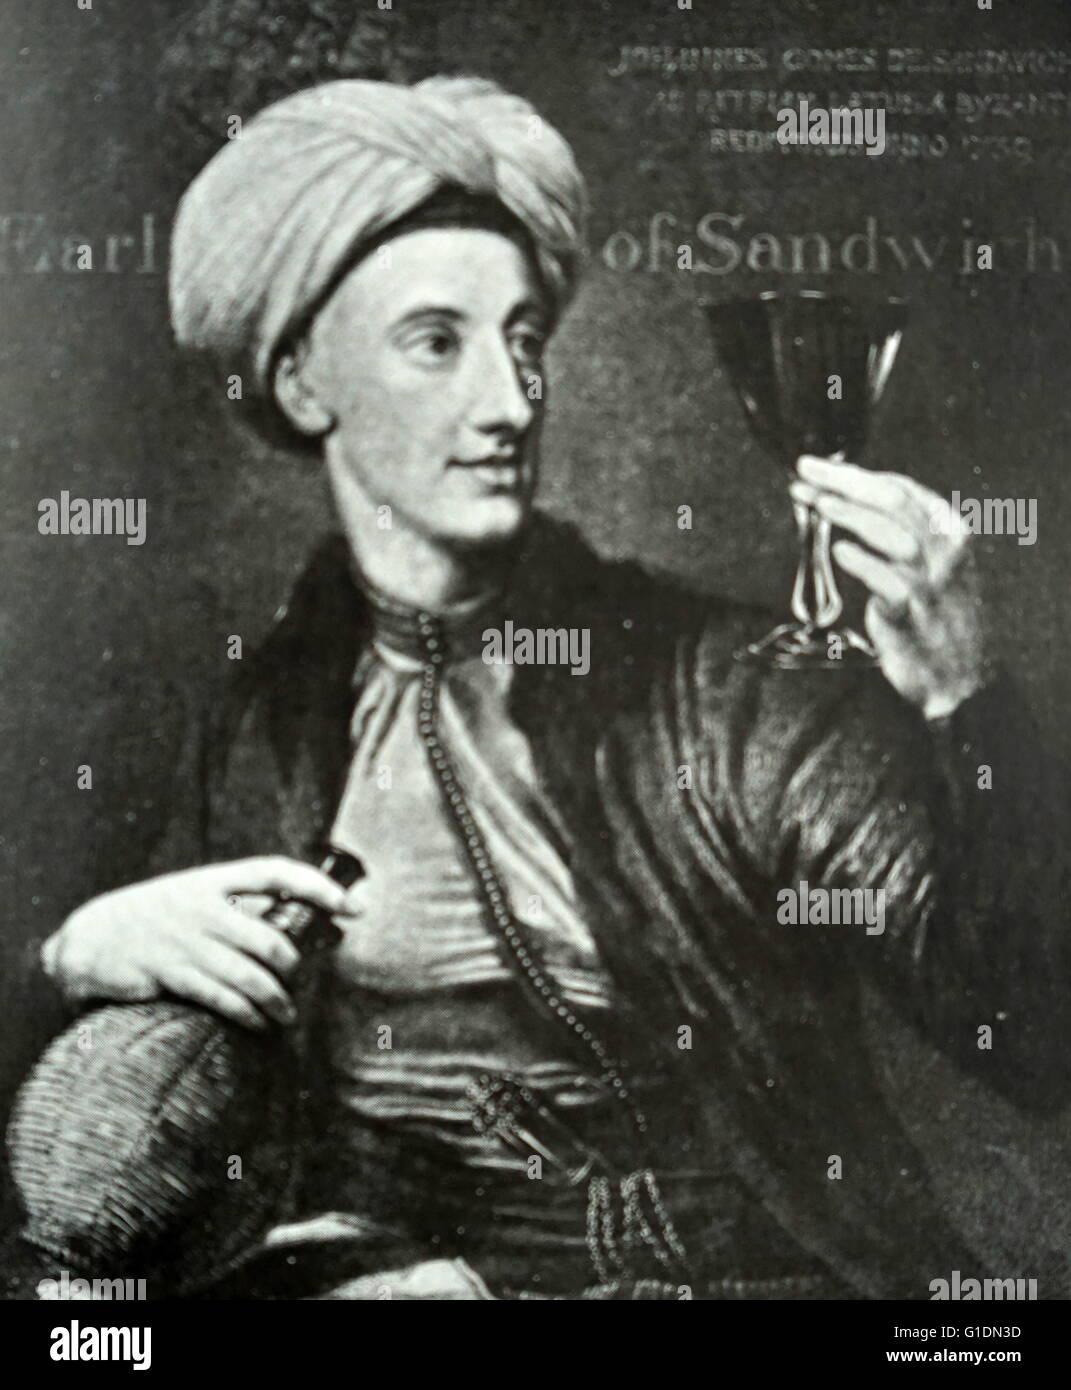 Portrait of John Montagu, 4th Earl of Sandwich (1718-1792) a British statesman. Dated 18th Century - Stock Image